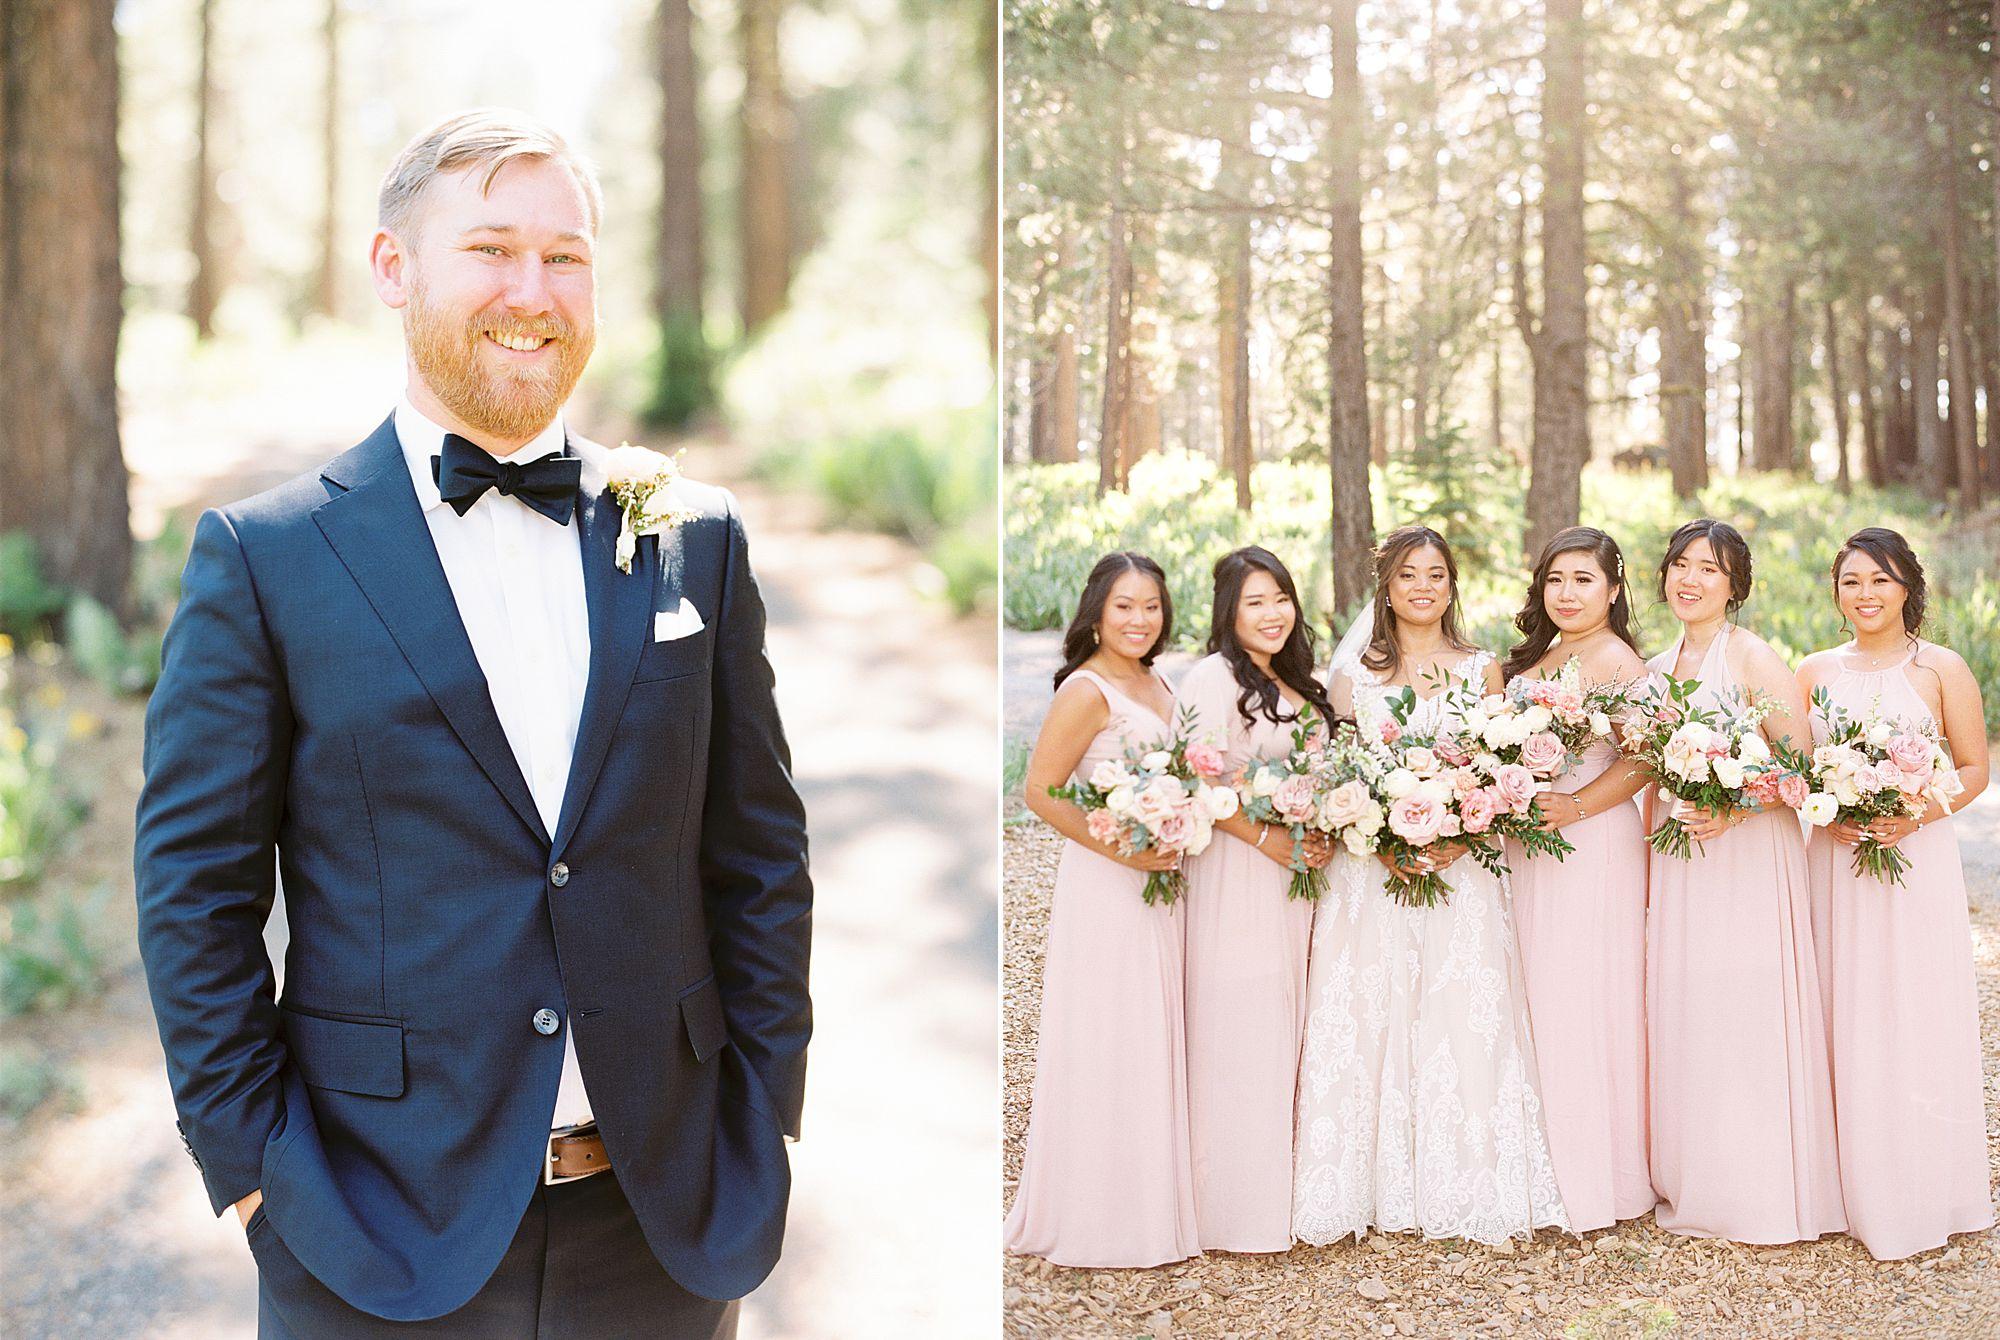 MITCHELLS MOUNTAIN MEADOWS Wedding - Ash Baumgartner - Phallina and Matt - Sierraville Wedding - Tahoe Wedding Photography_0010.jpg